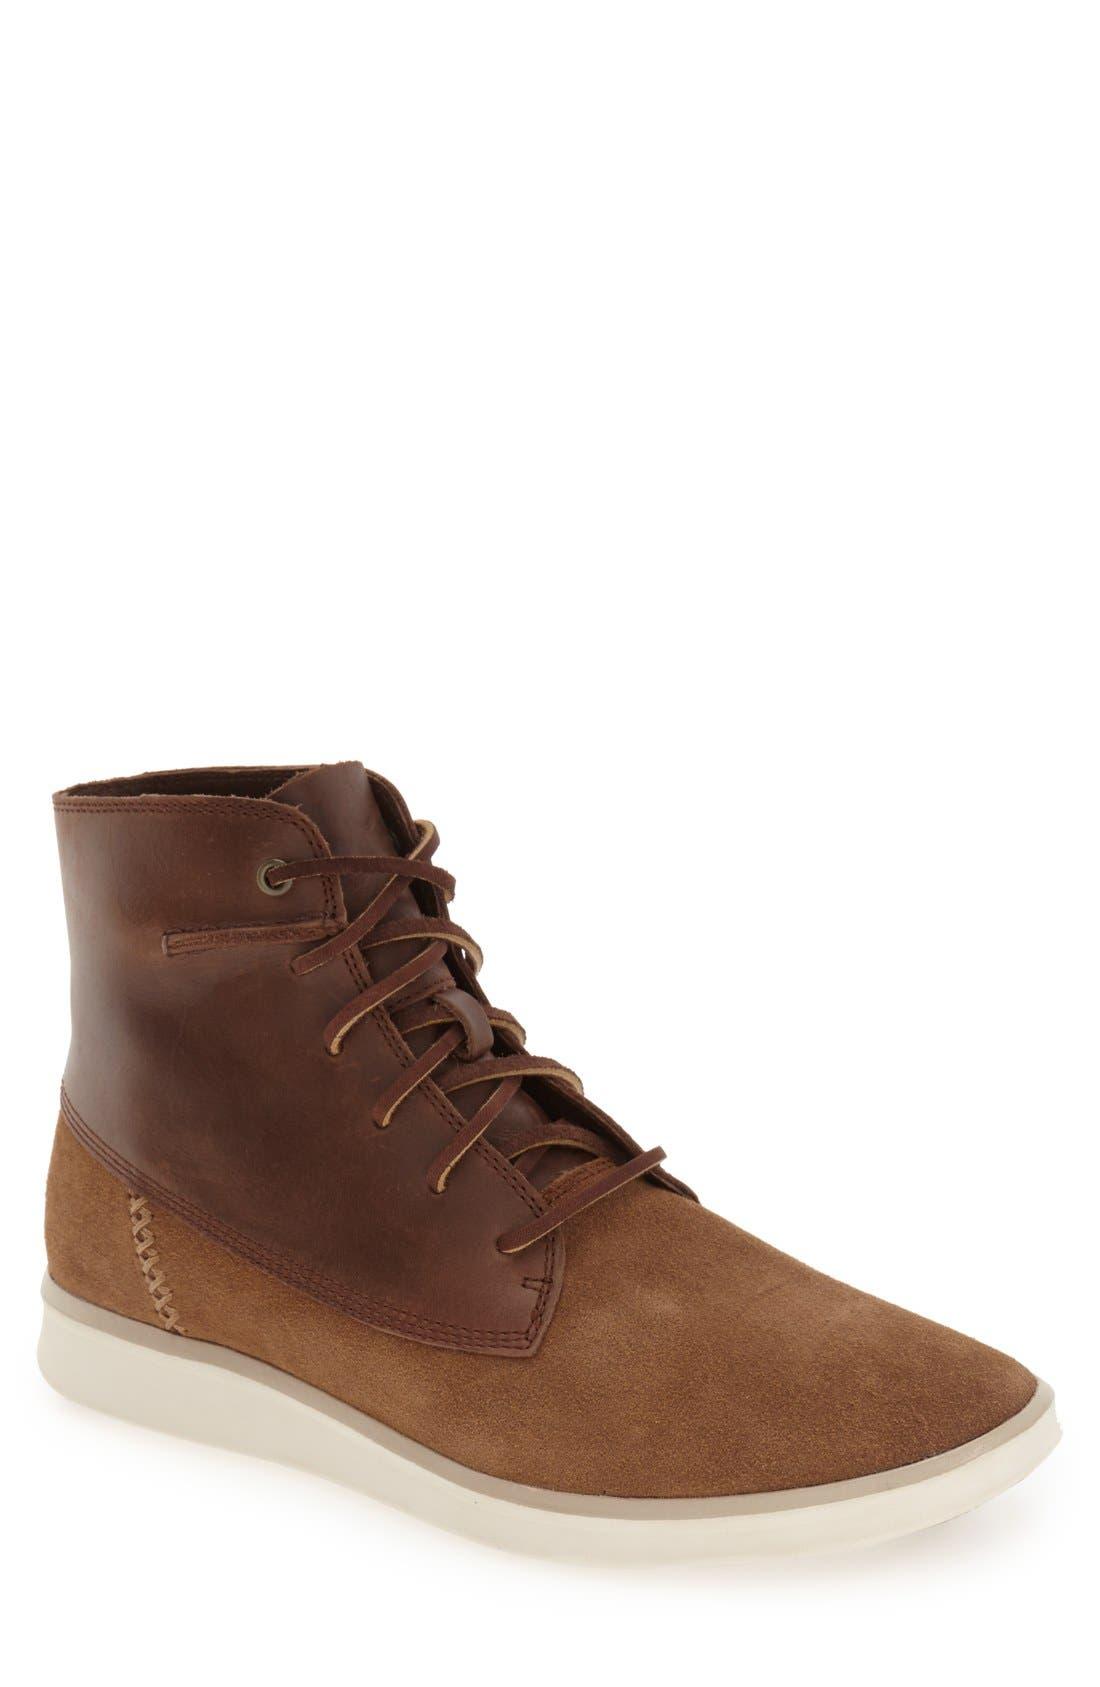 'Lamont' High Top Sneaker,                             Main thumbnail 1, color,